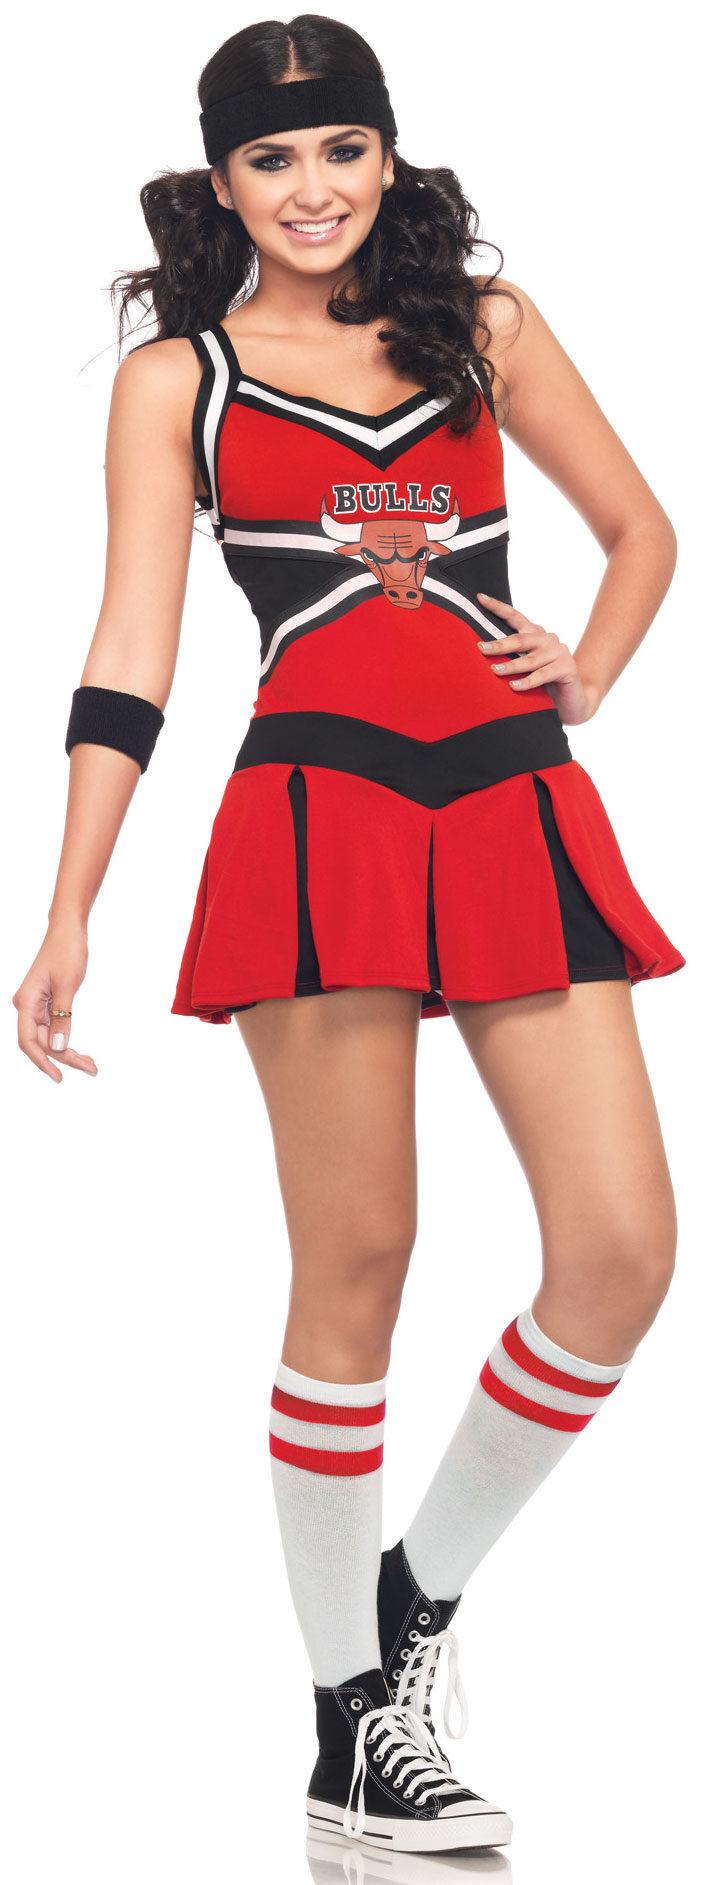 Sexy Chicago Bulls Cheerleader Costume  sc 1 st  Mr. Costumes & Sexy Chicago Bulls Cheerleader Costume - Mr. Costumes